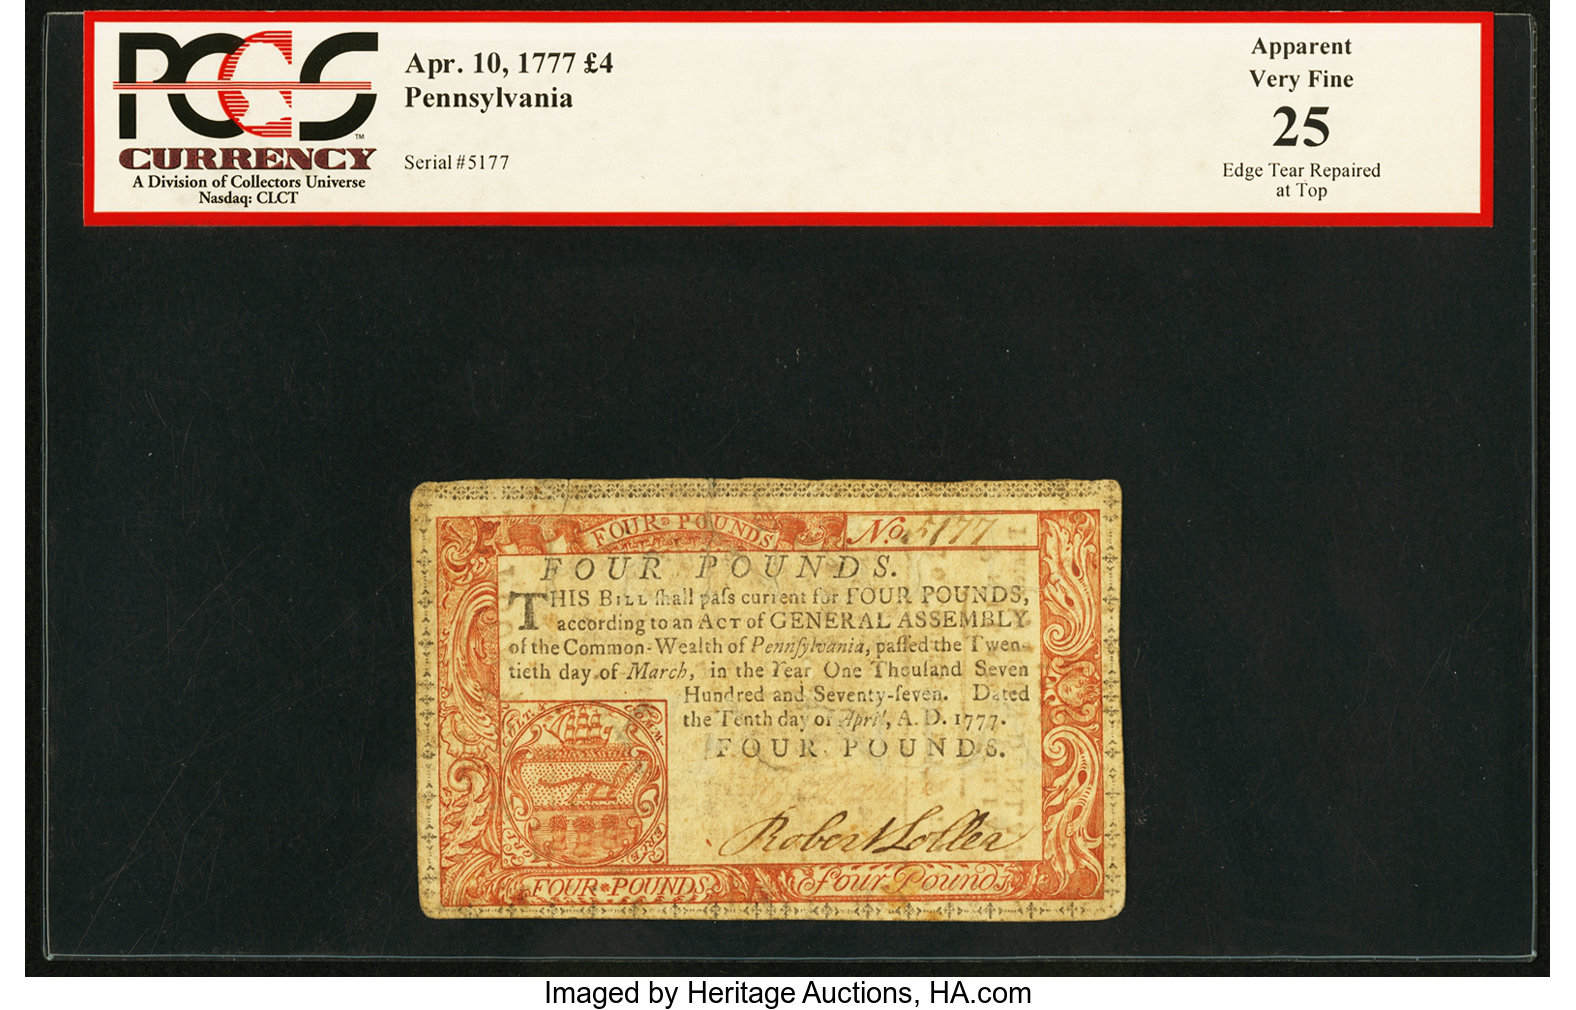 sample image for 1777 10-Apr £4 (Fr.# PA224b)